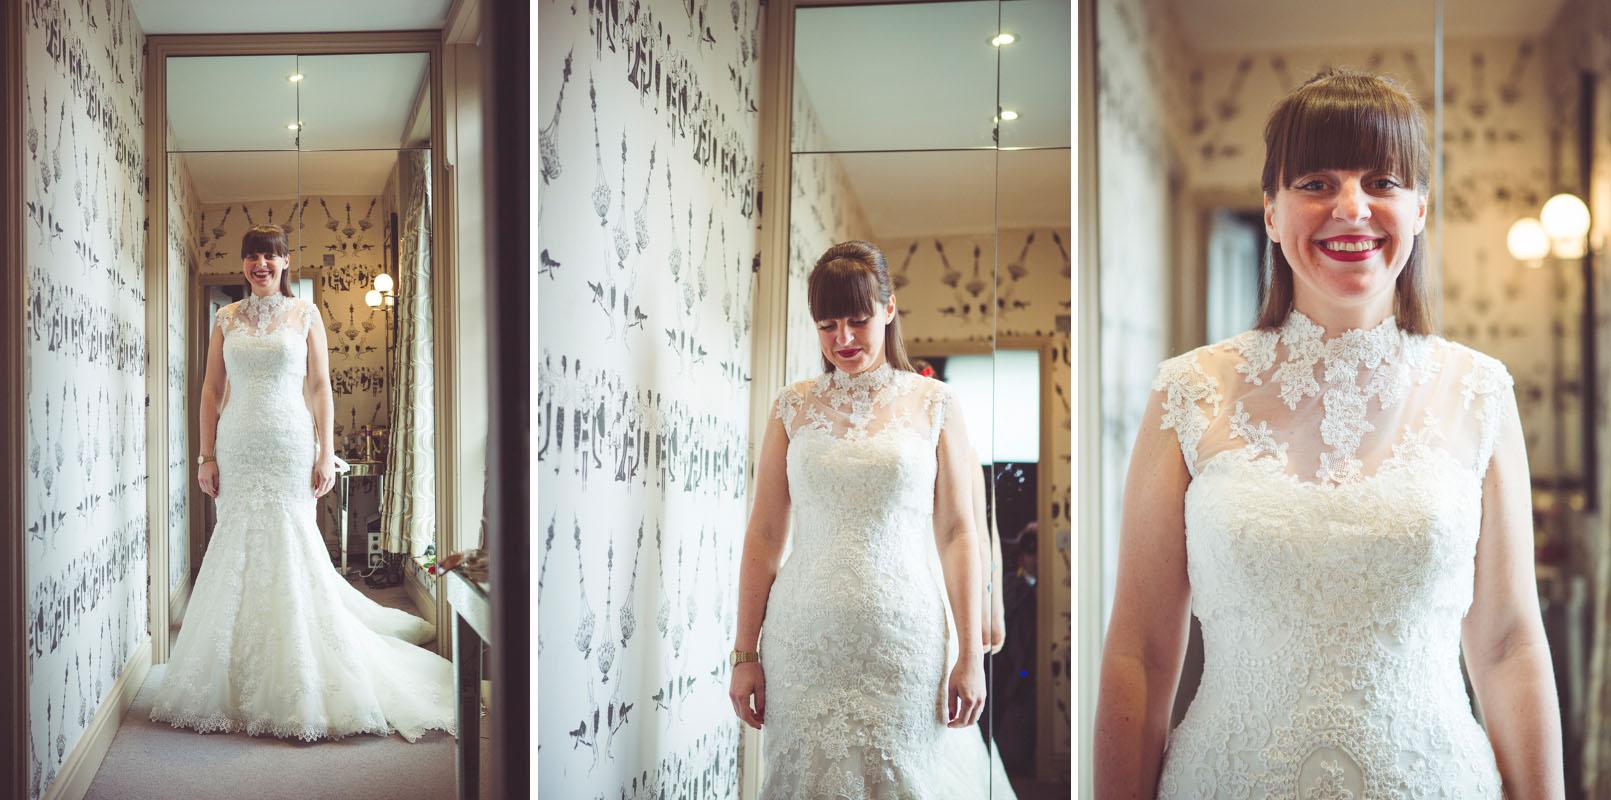 My Beautiful Bride wedding Photography 5.jpg